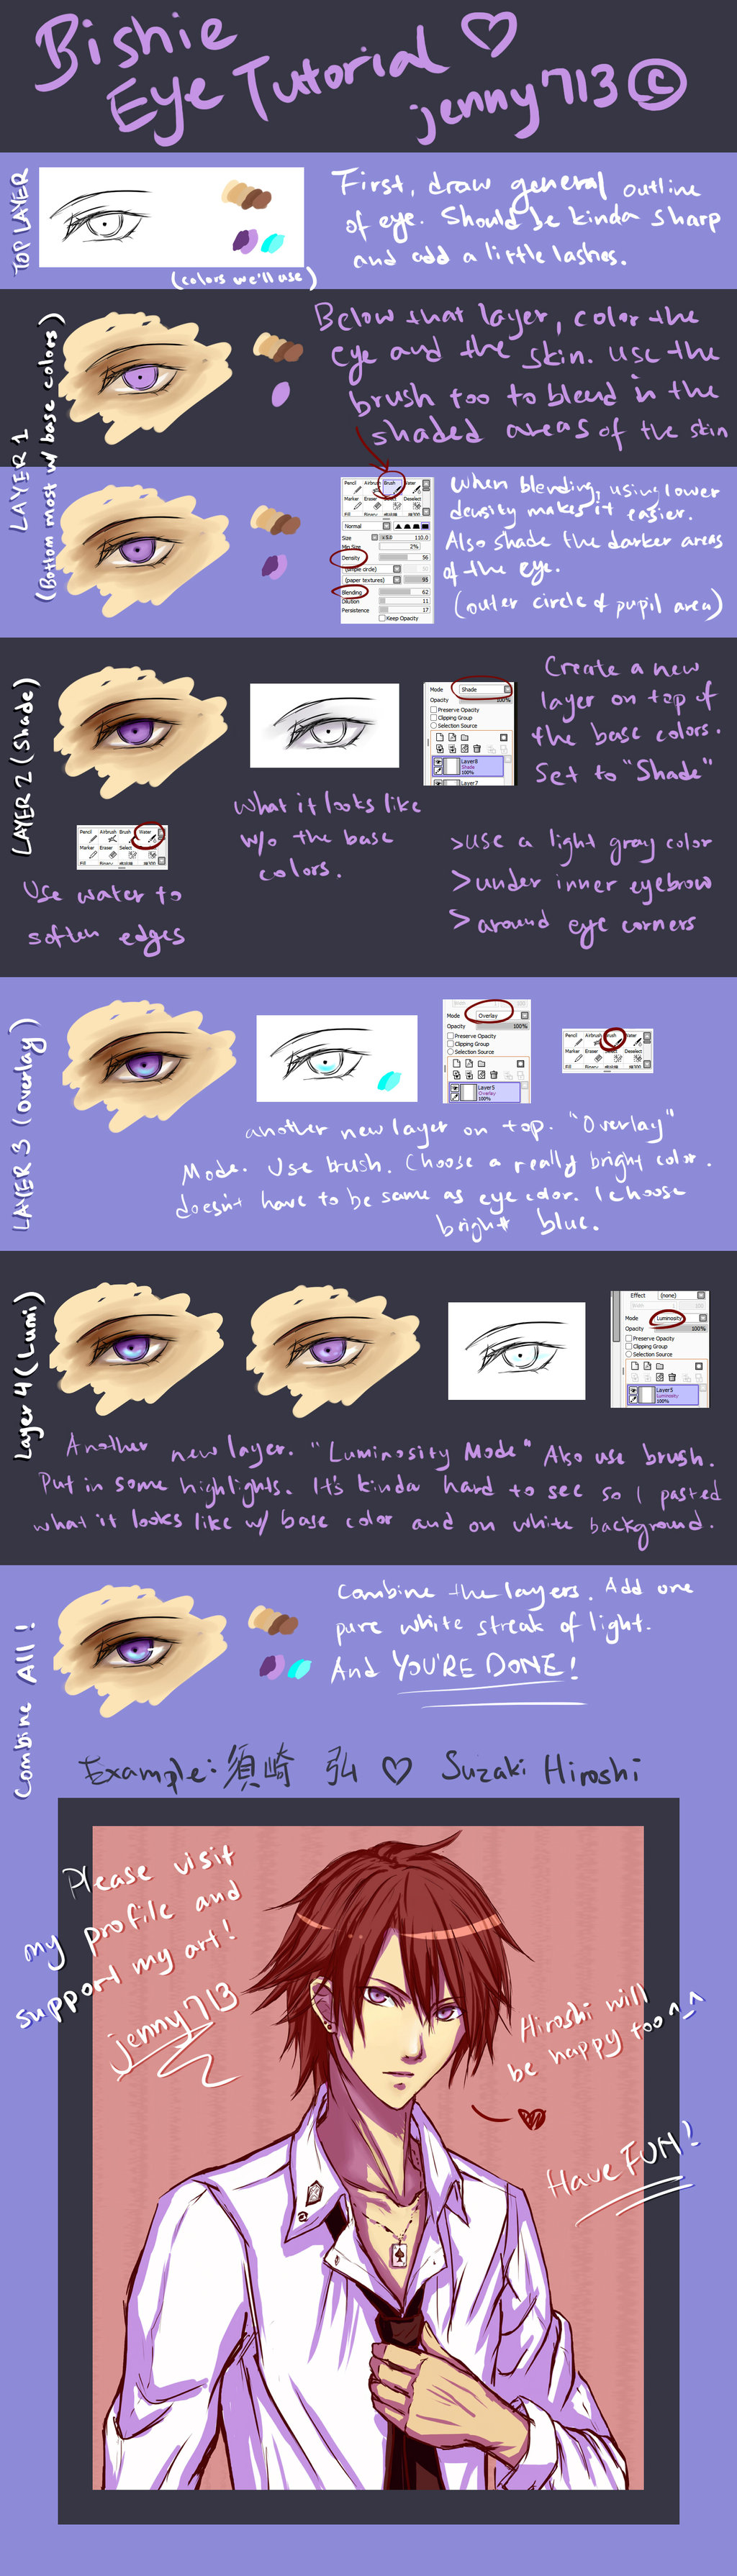 Haruka Nanase Cosplay makeup tutorial, Anime cosplay